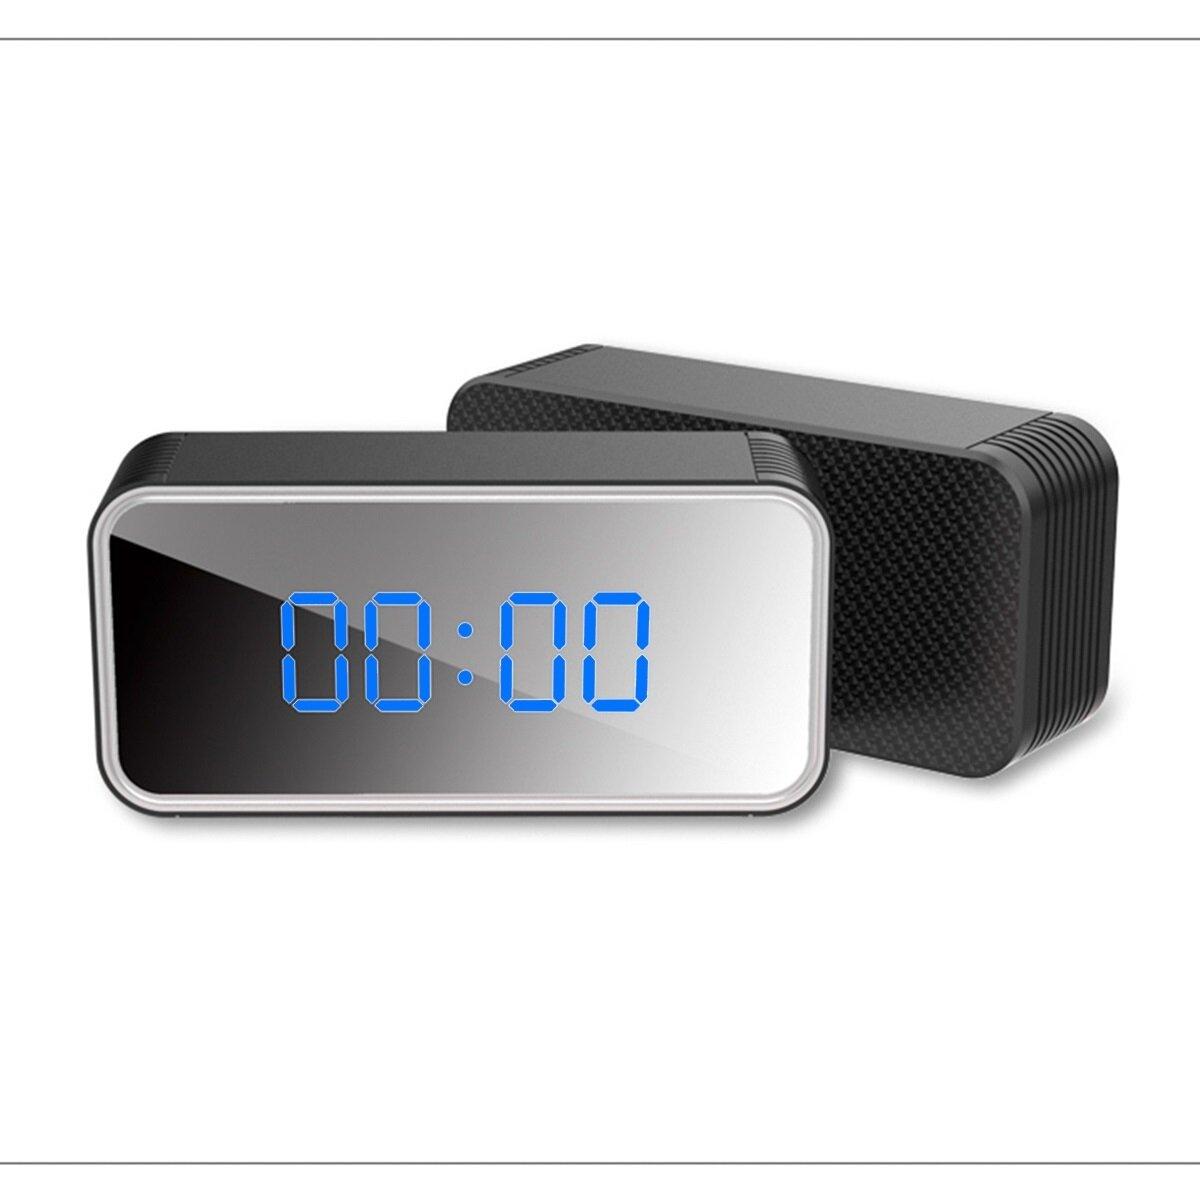 H13 Wireless Nanny Clock 4K WIFI M ini Camera Time Alarm P2P IP/AP Security Night Vision Motion Sensor Remote Monitor Micro Home